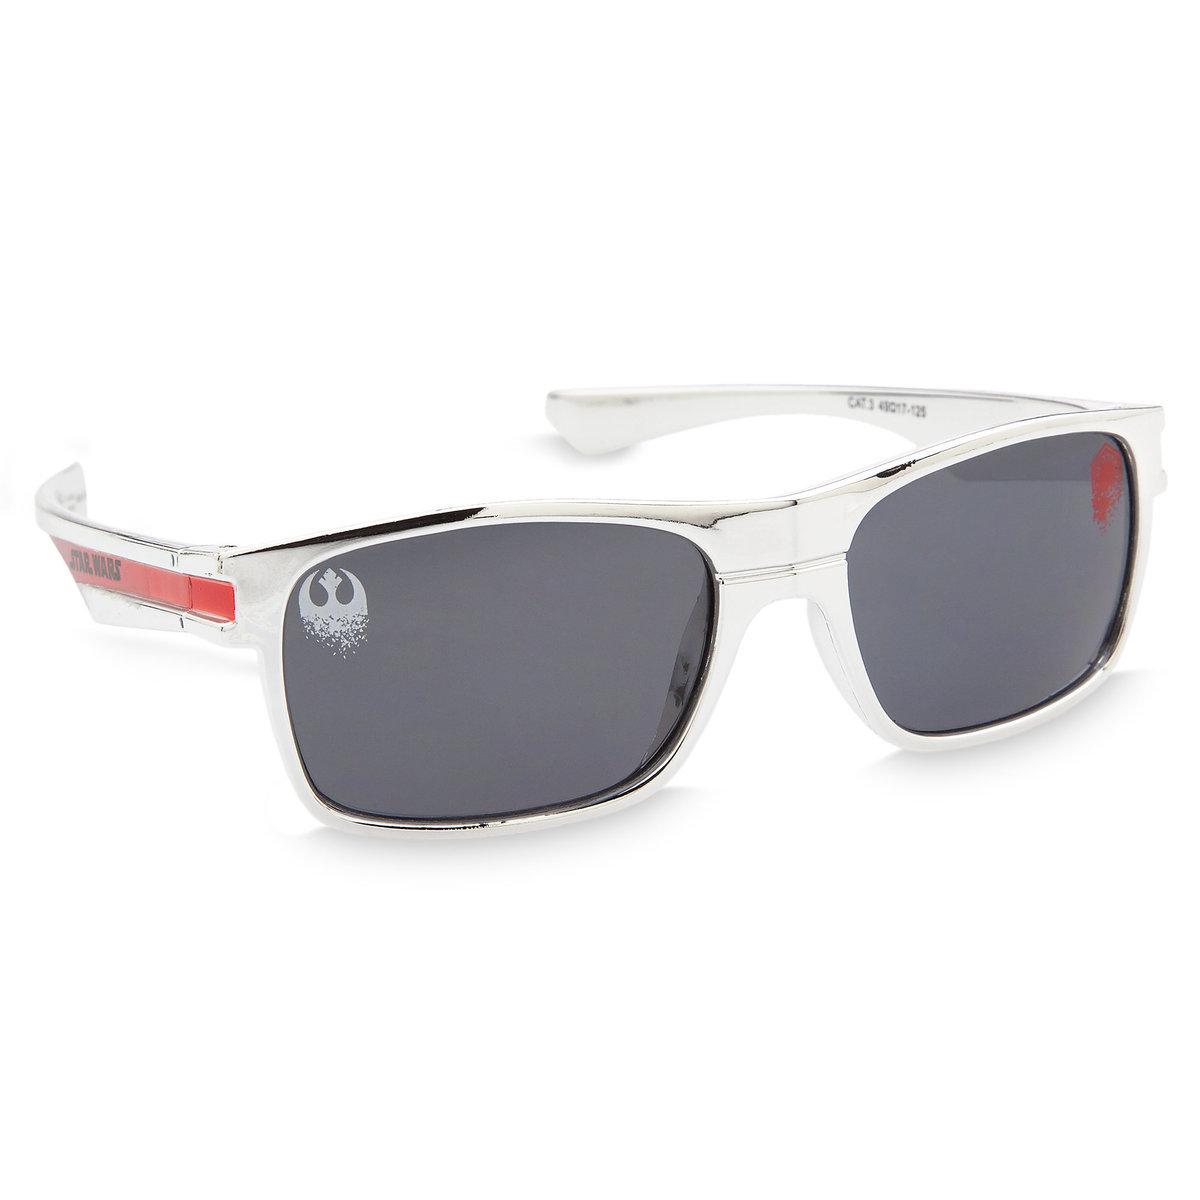 Star Wars Sunglasses for Kids ของแท้ นำเข้าจากอเมริกา